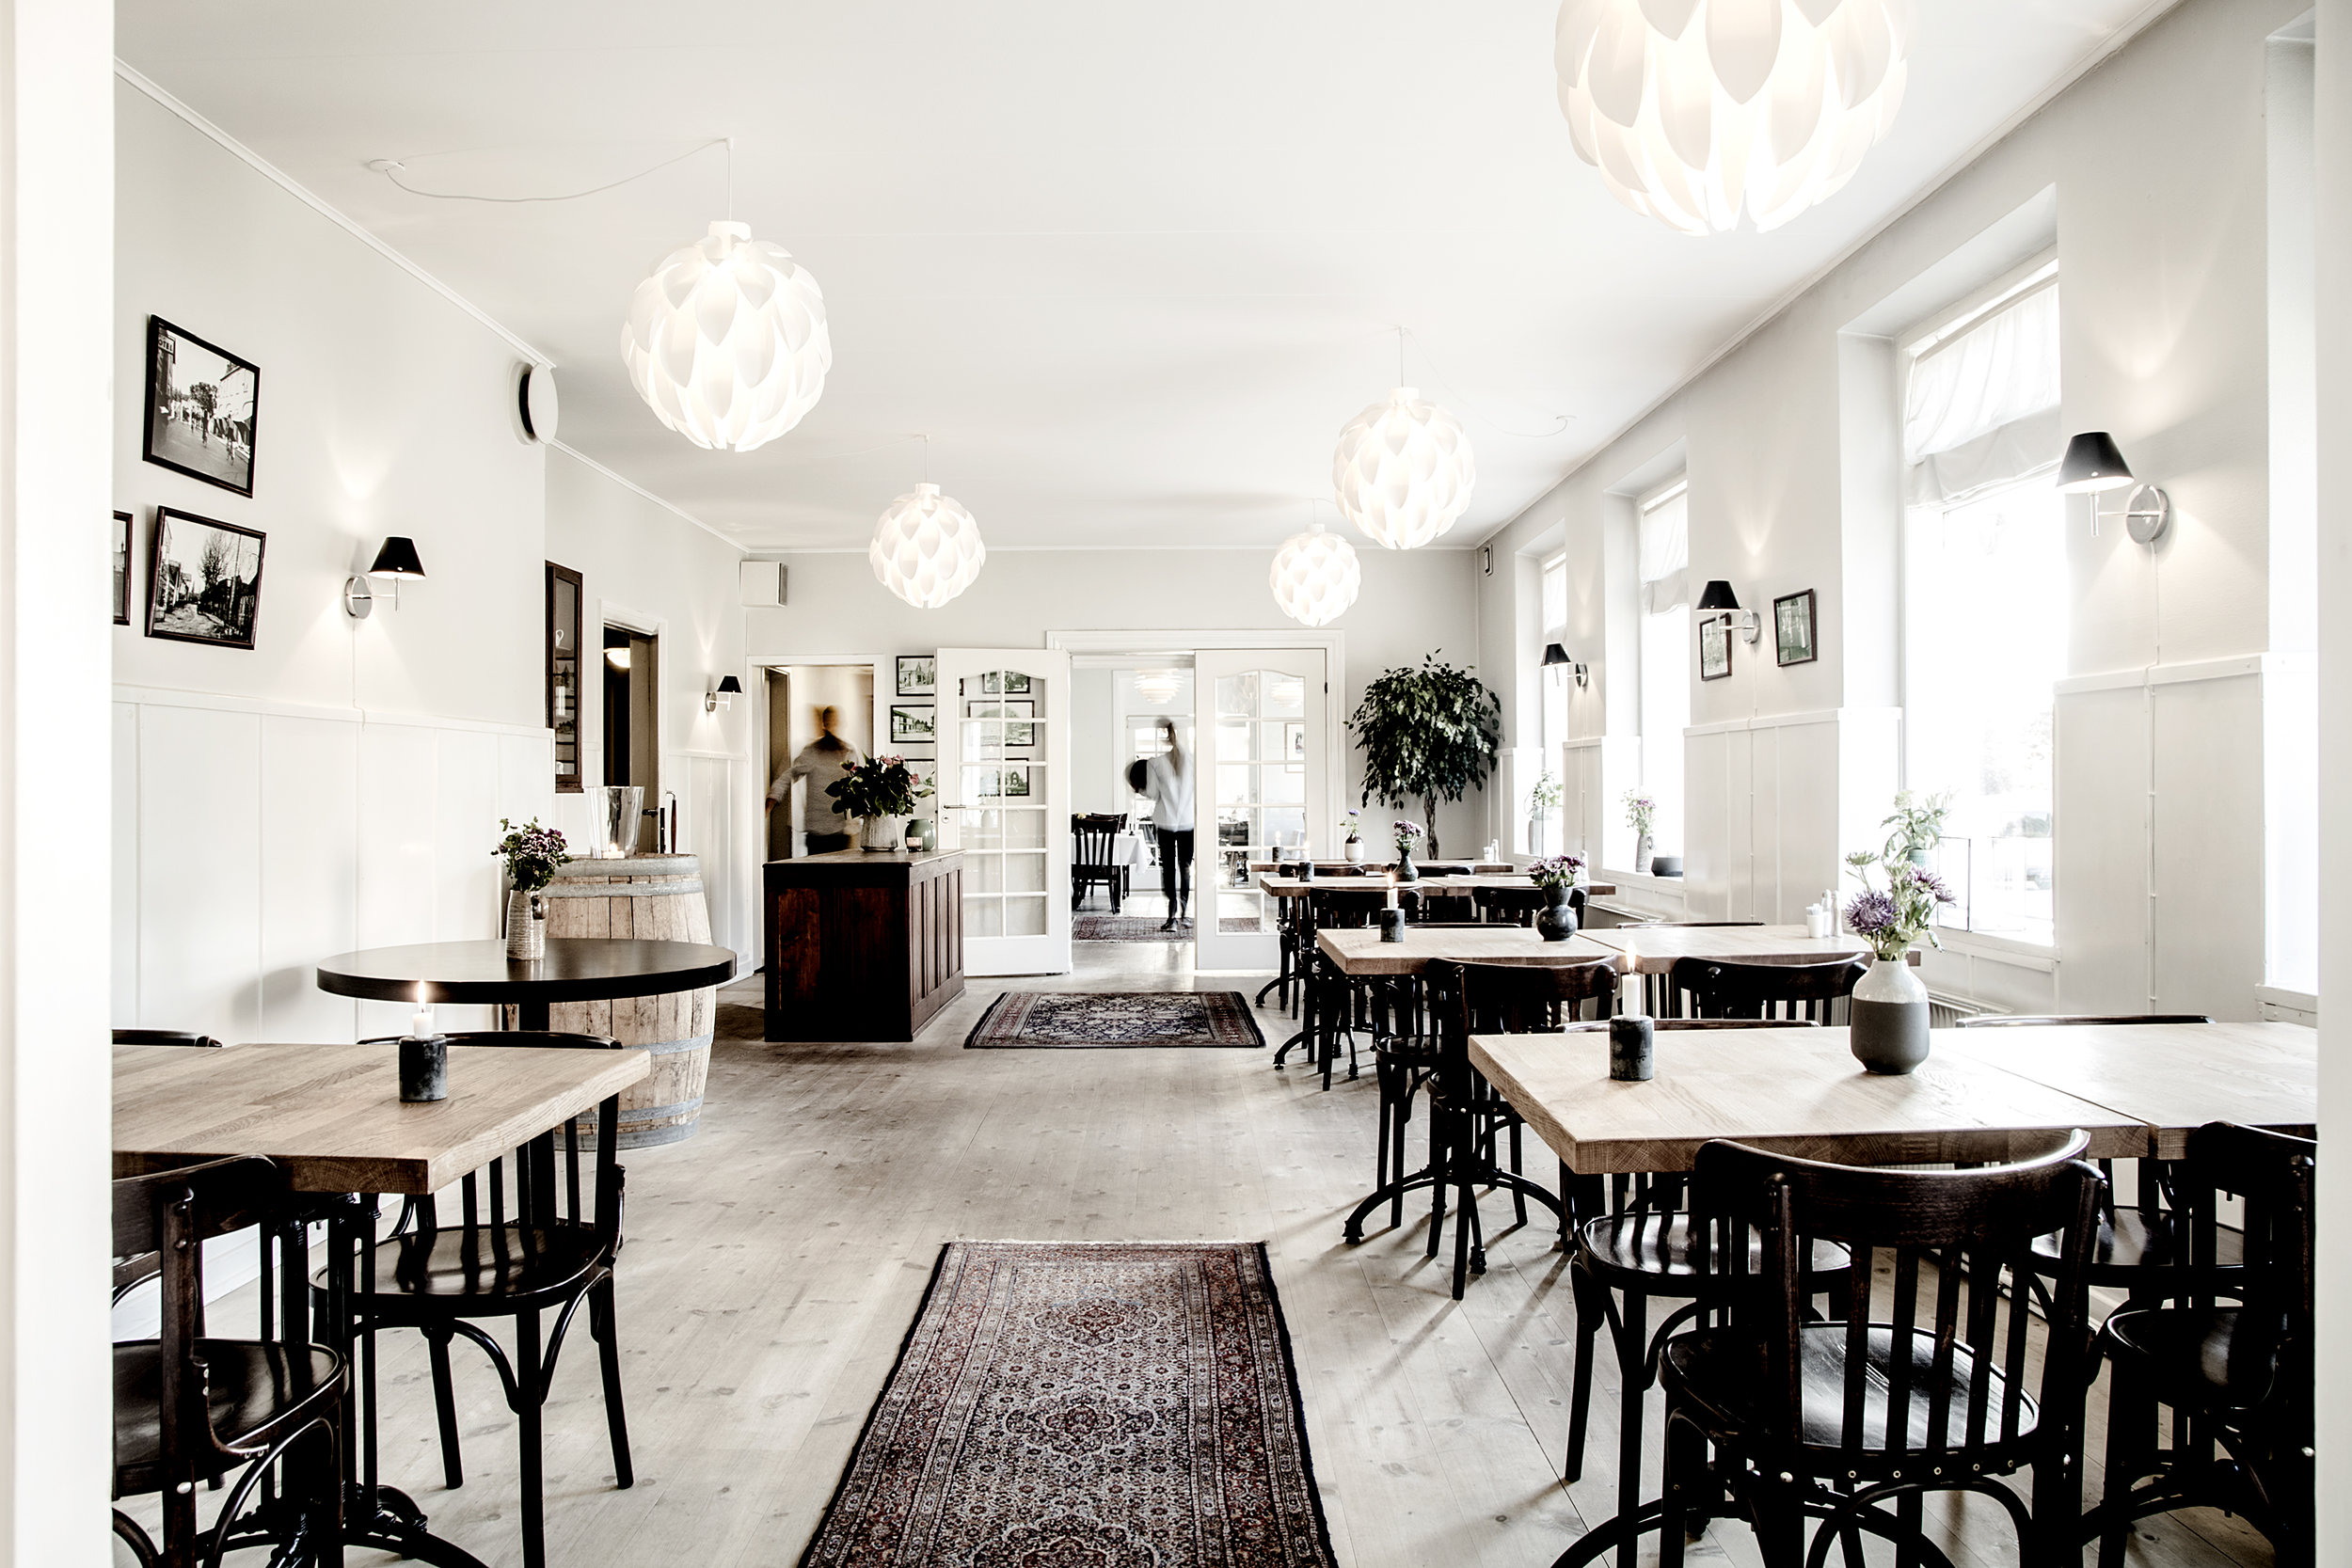 flinchs_rrestaurant_1.jpg